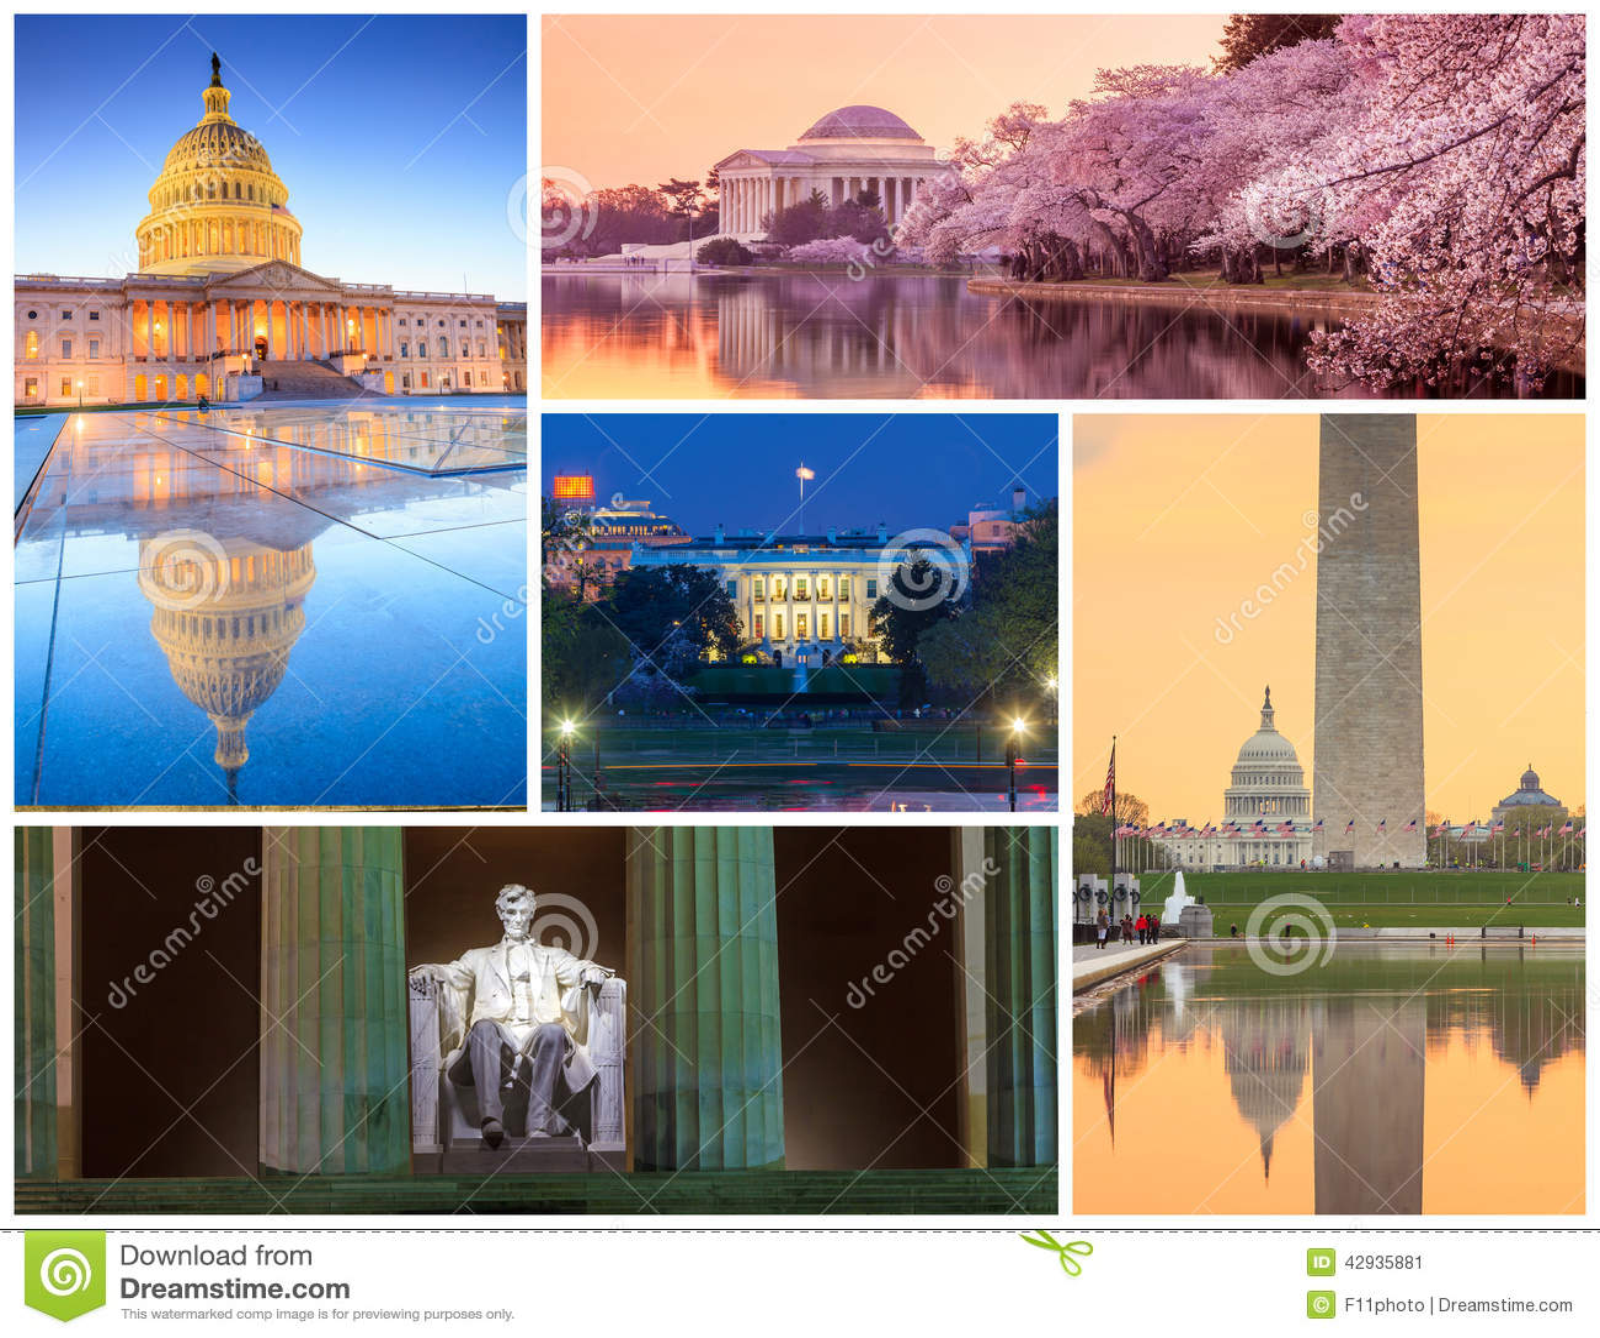 Washington DC Famous Landmarks Picture Collage Stock Photo Image - Washington dc map landmarks